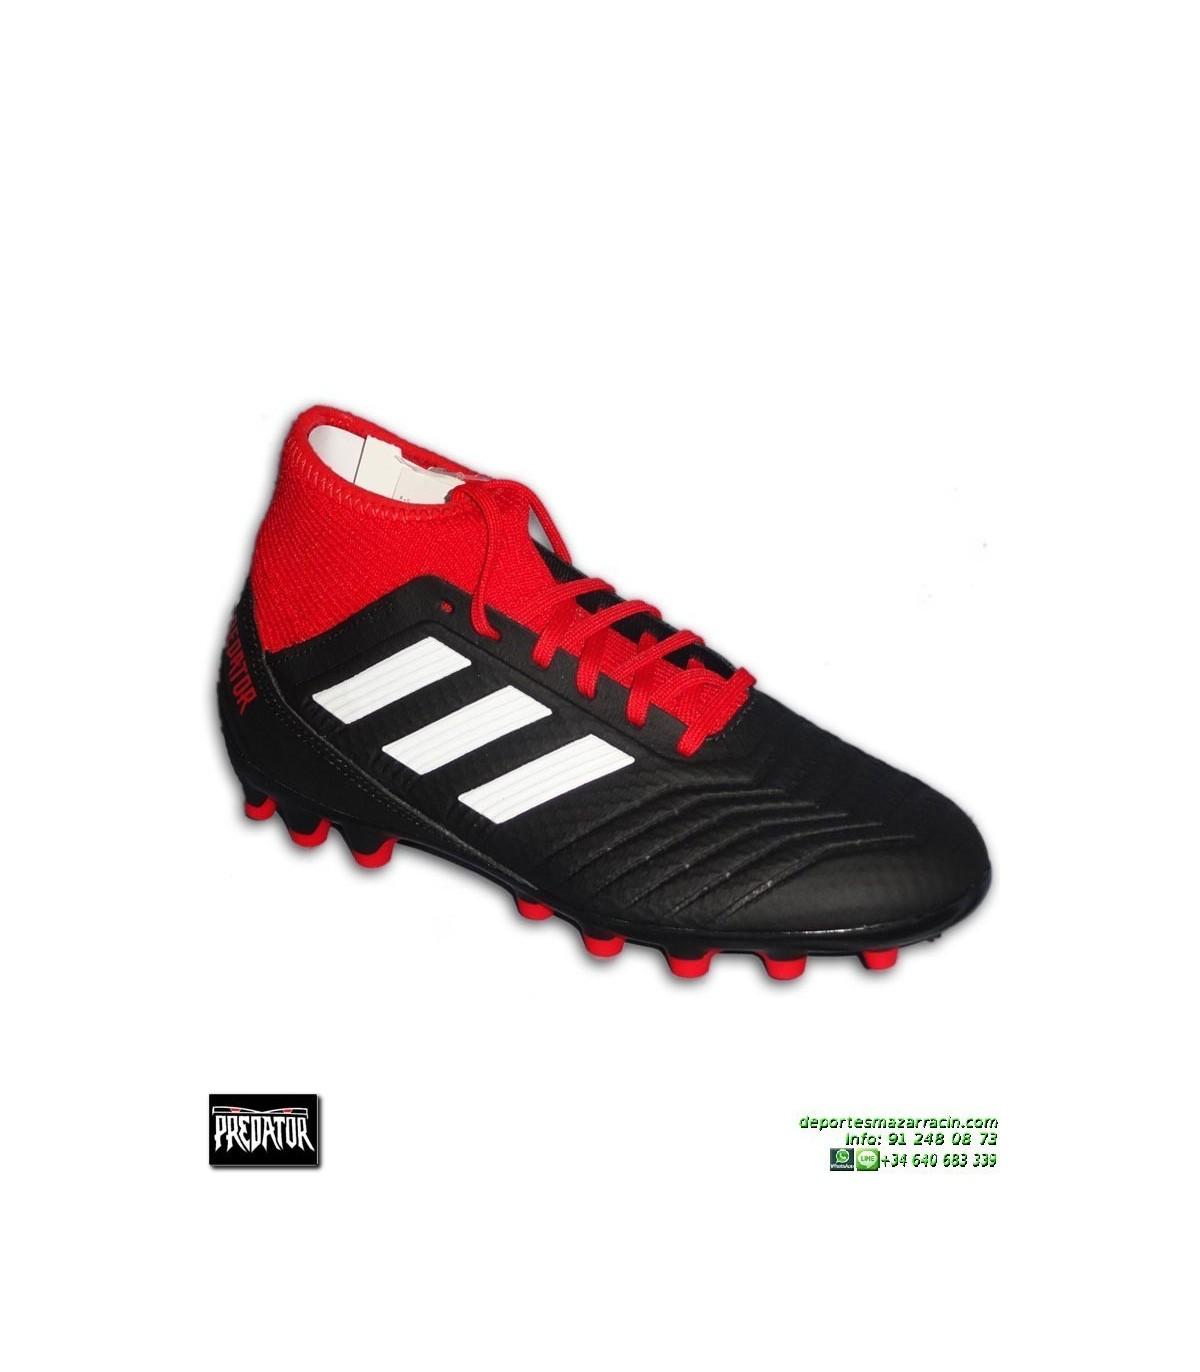 6f88b944240 ... ADIDAS PREDATOR 18.3 AG Negro-Rojo Bota Futbol Calcetin Hierba  Artificial · ADIDAS ...